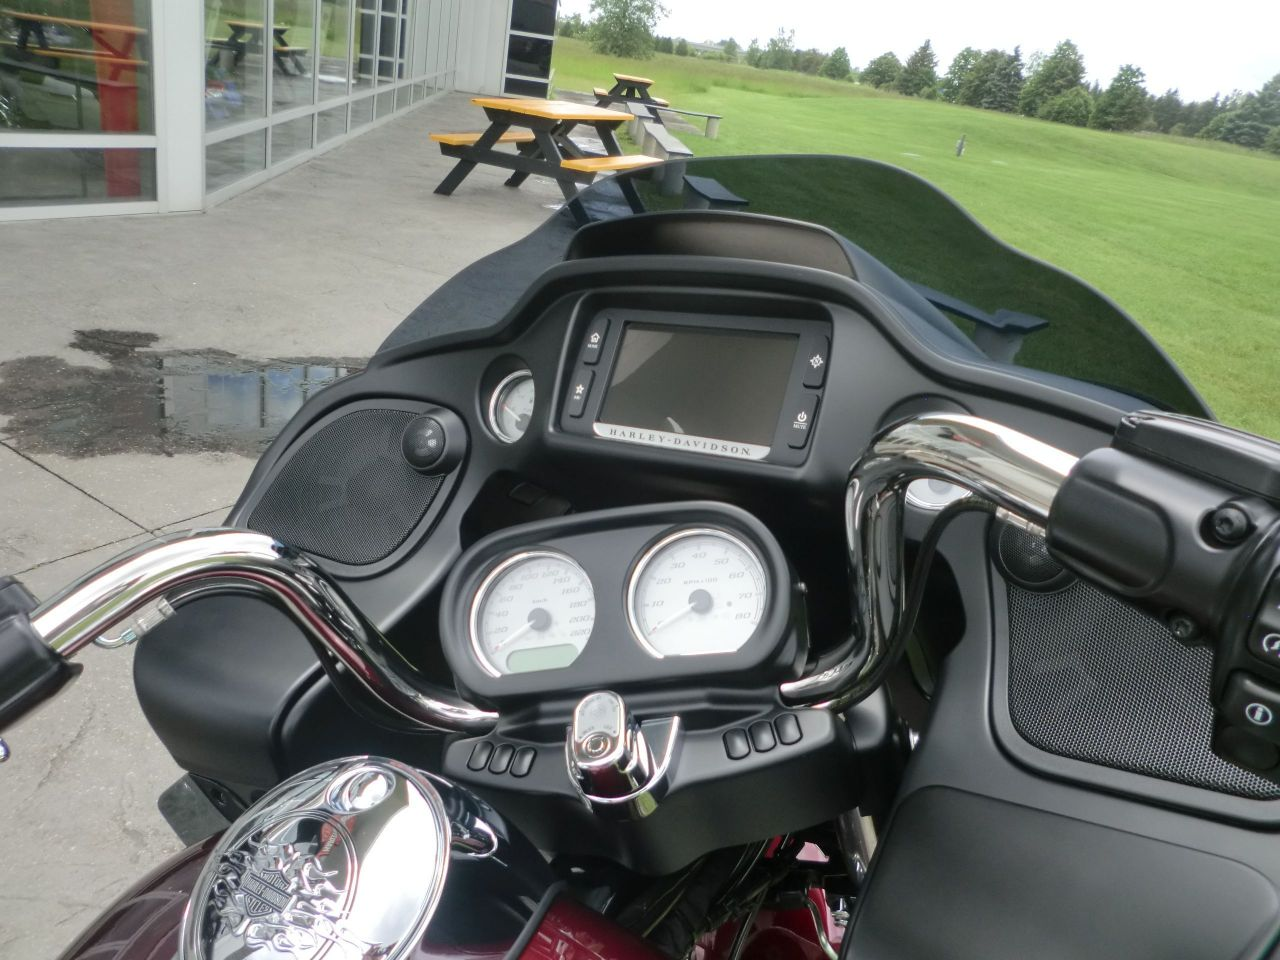 2015 Harley-Davidson Other